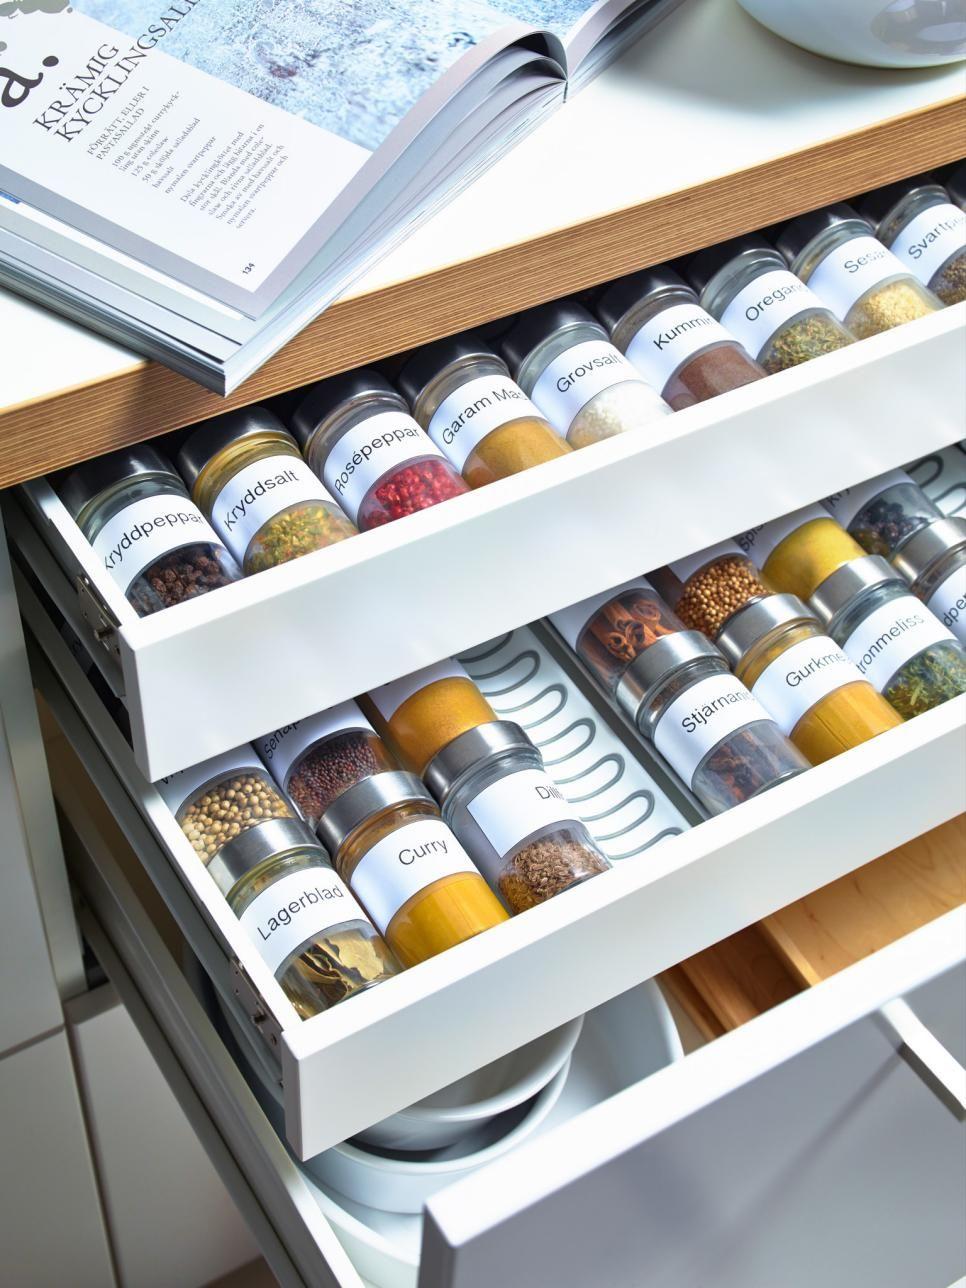 Kitchen drawer inserts for spices - 15 Creative Spice Storage Ideas